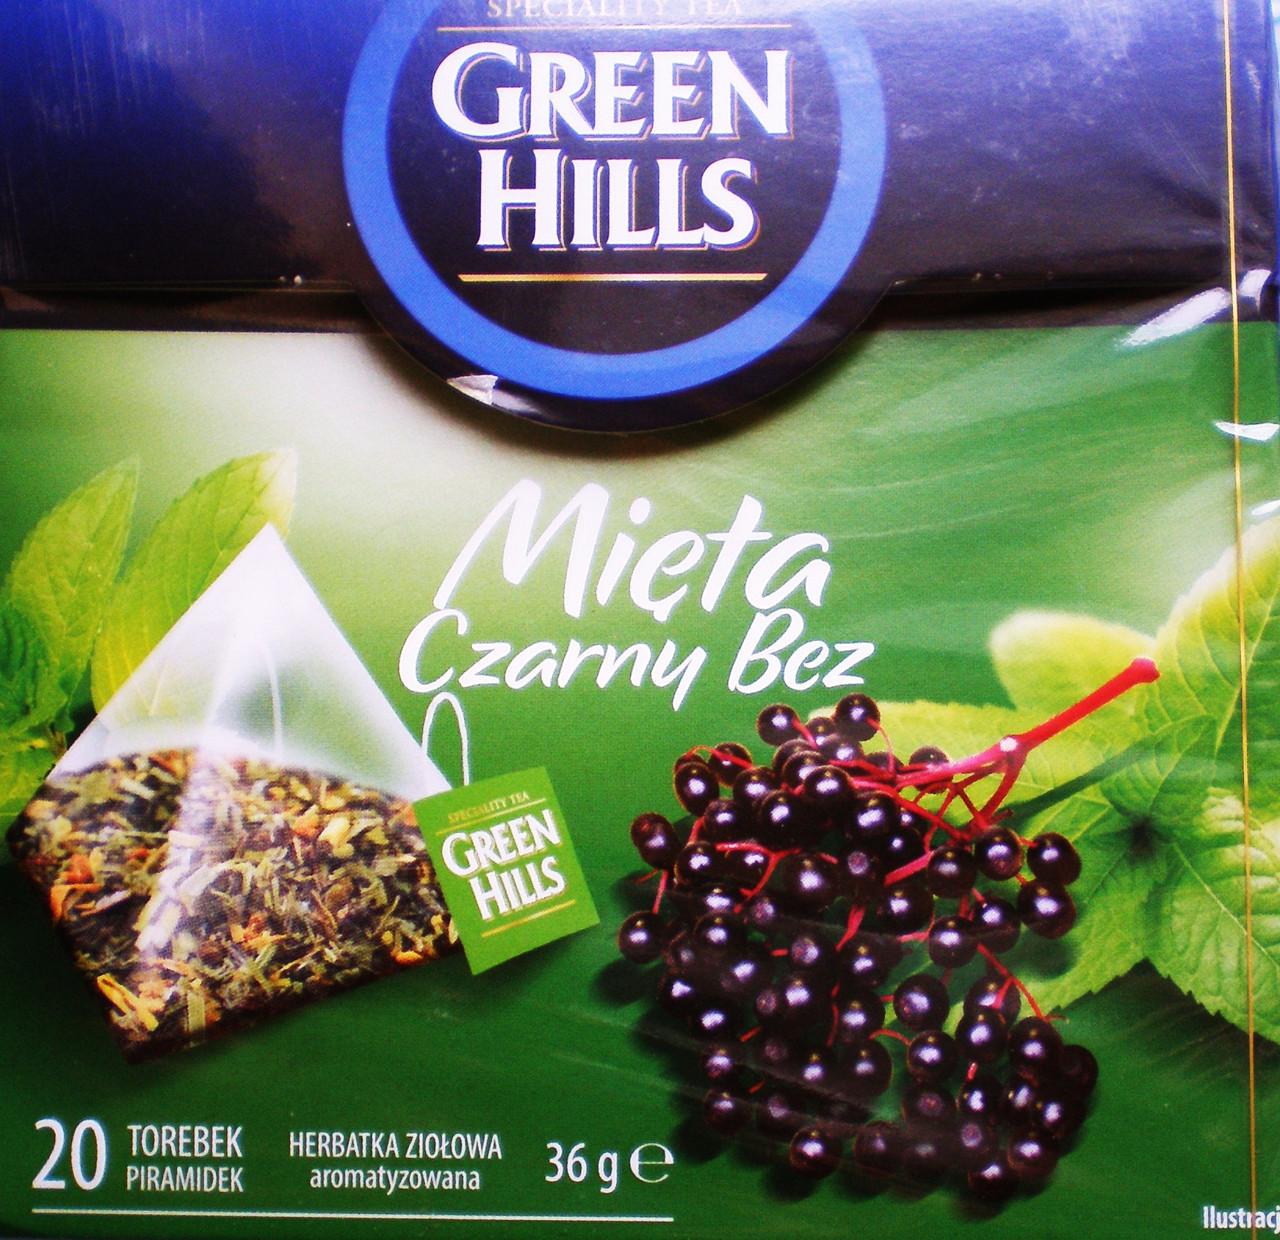 Чай Green Hills Mieta Czarny Bez 20 пакетов